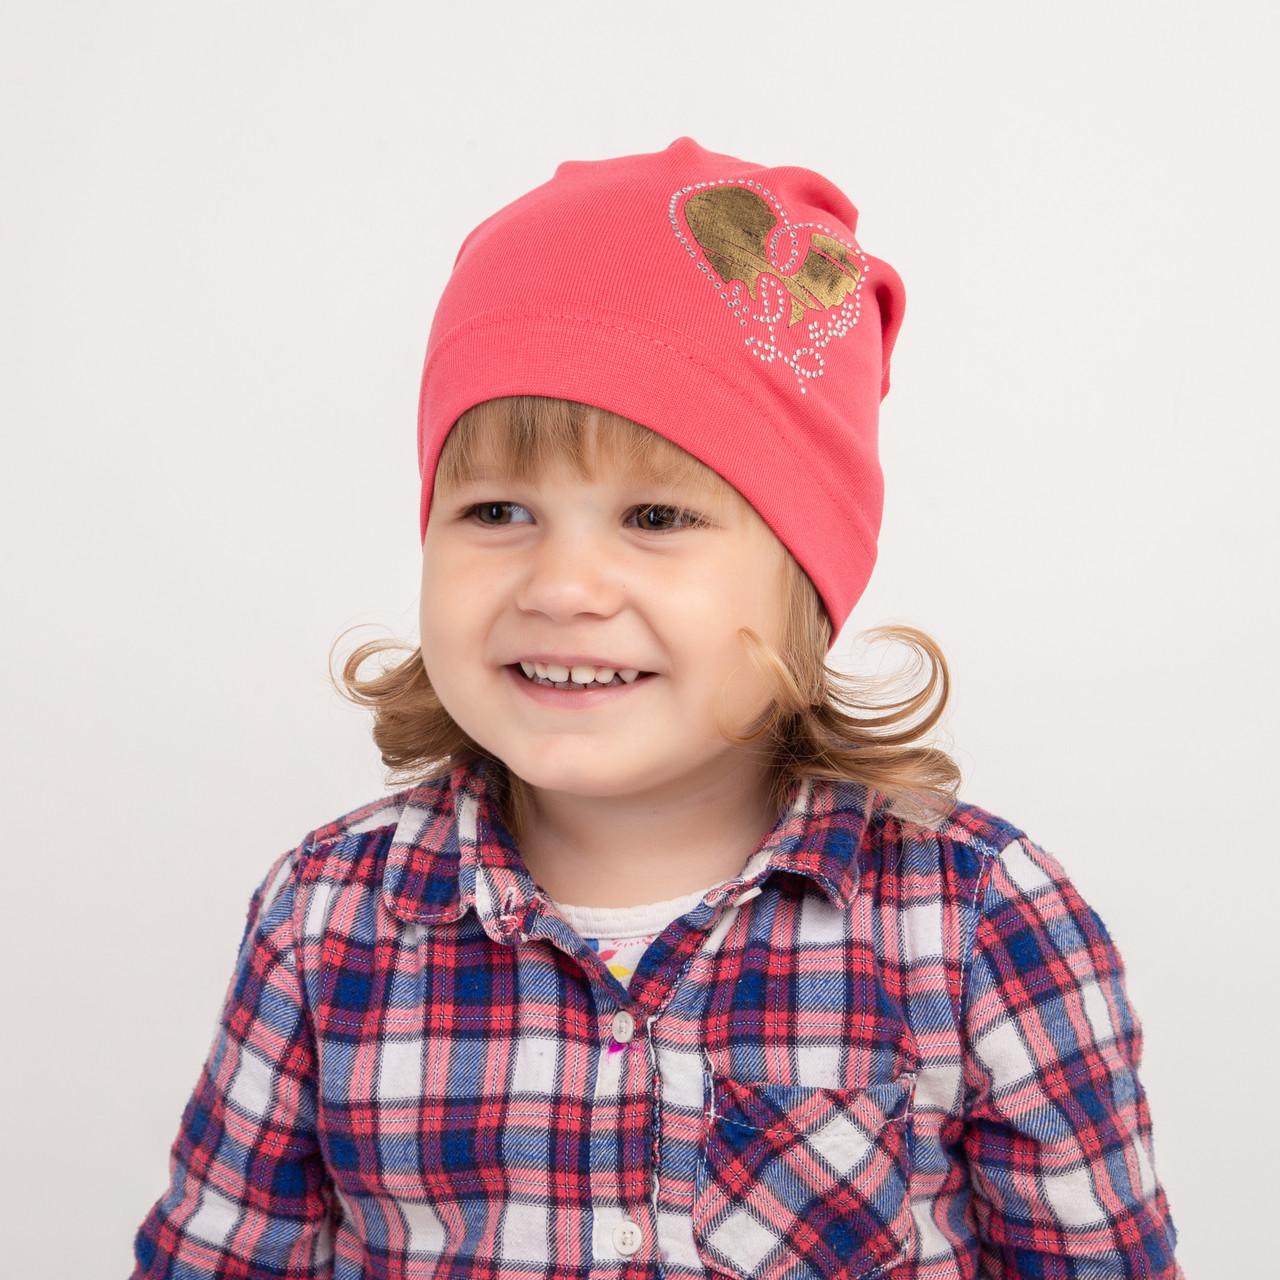 Хлопковая шапка на осень для девочки - Love - Артикул 2317